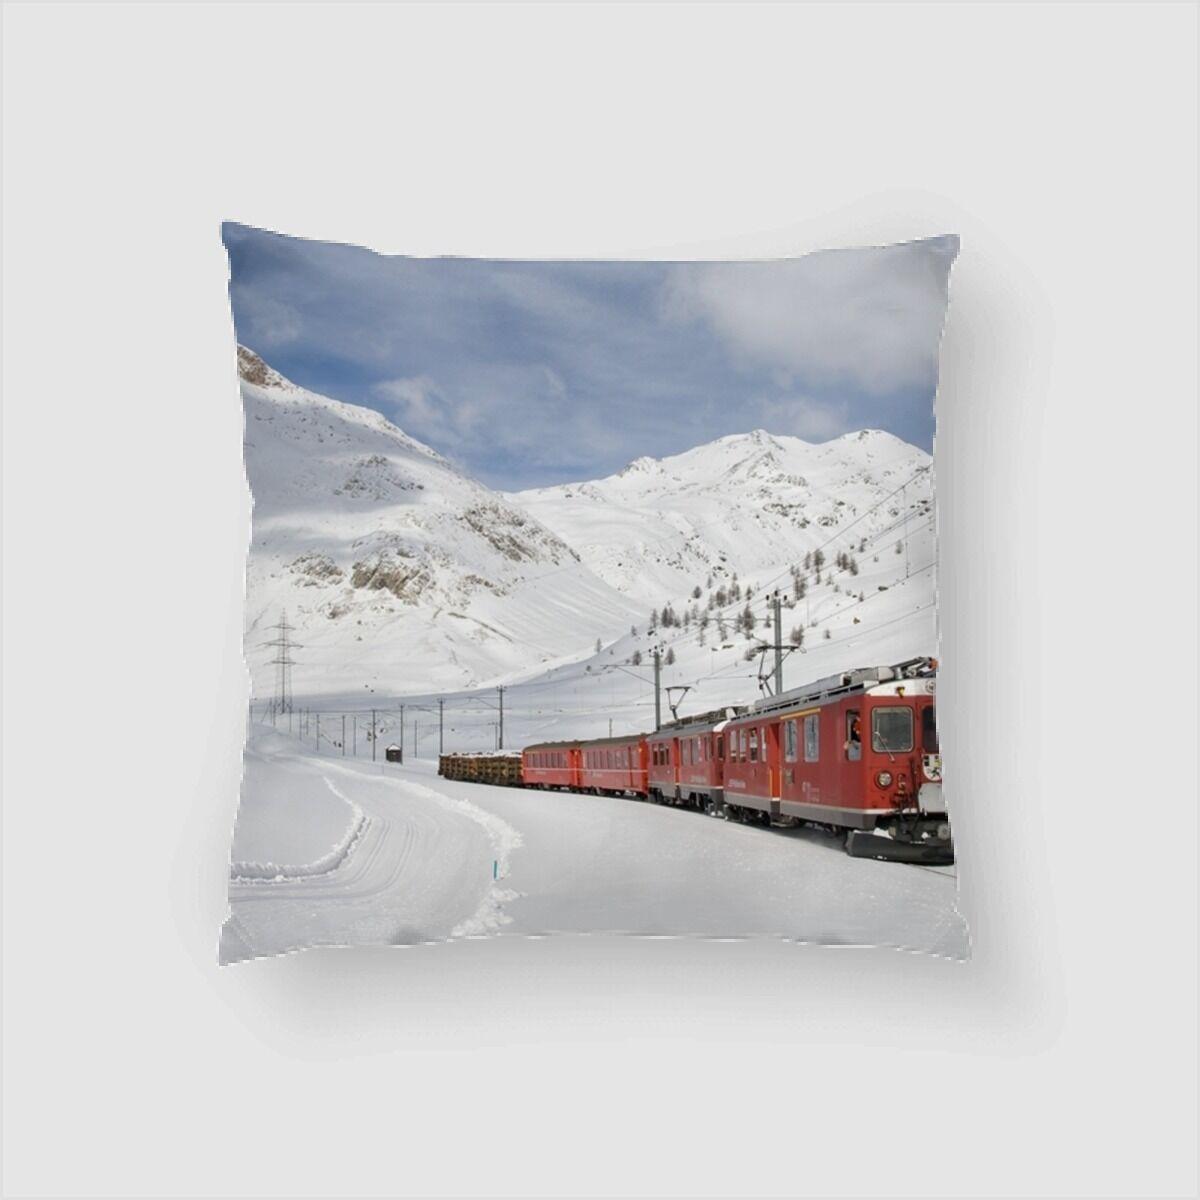 Lam Train in Snow (1) Throw Pillow